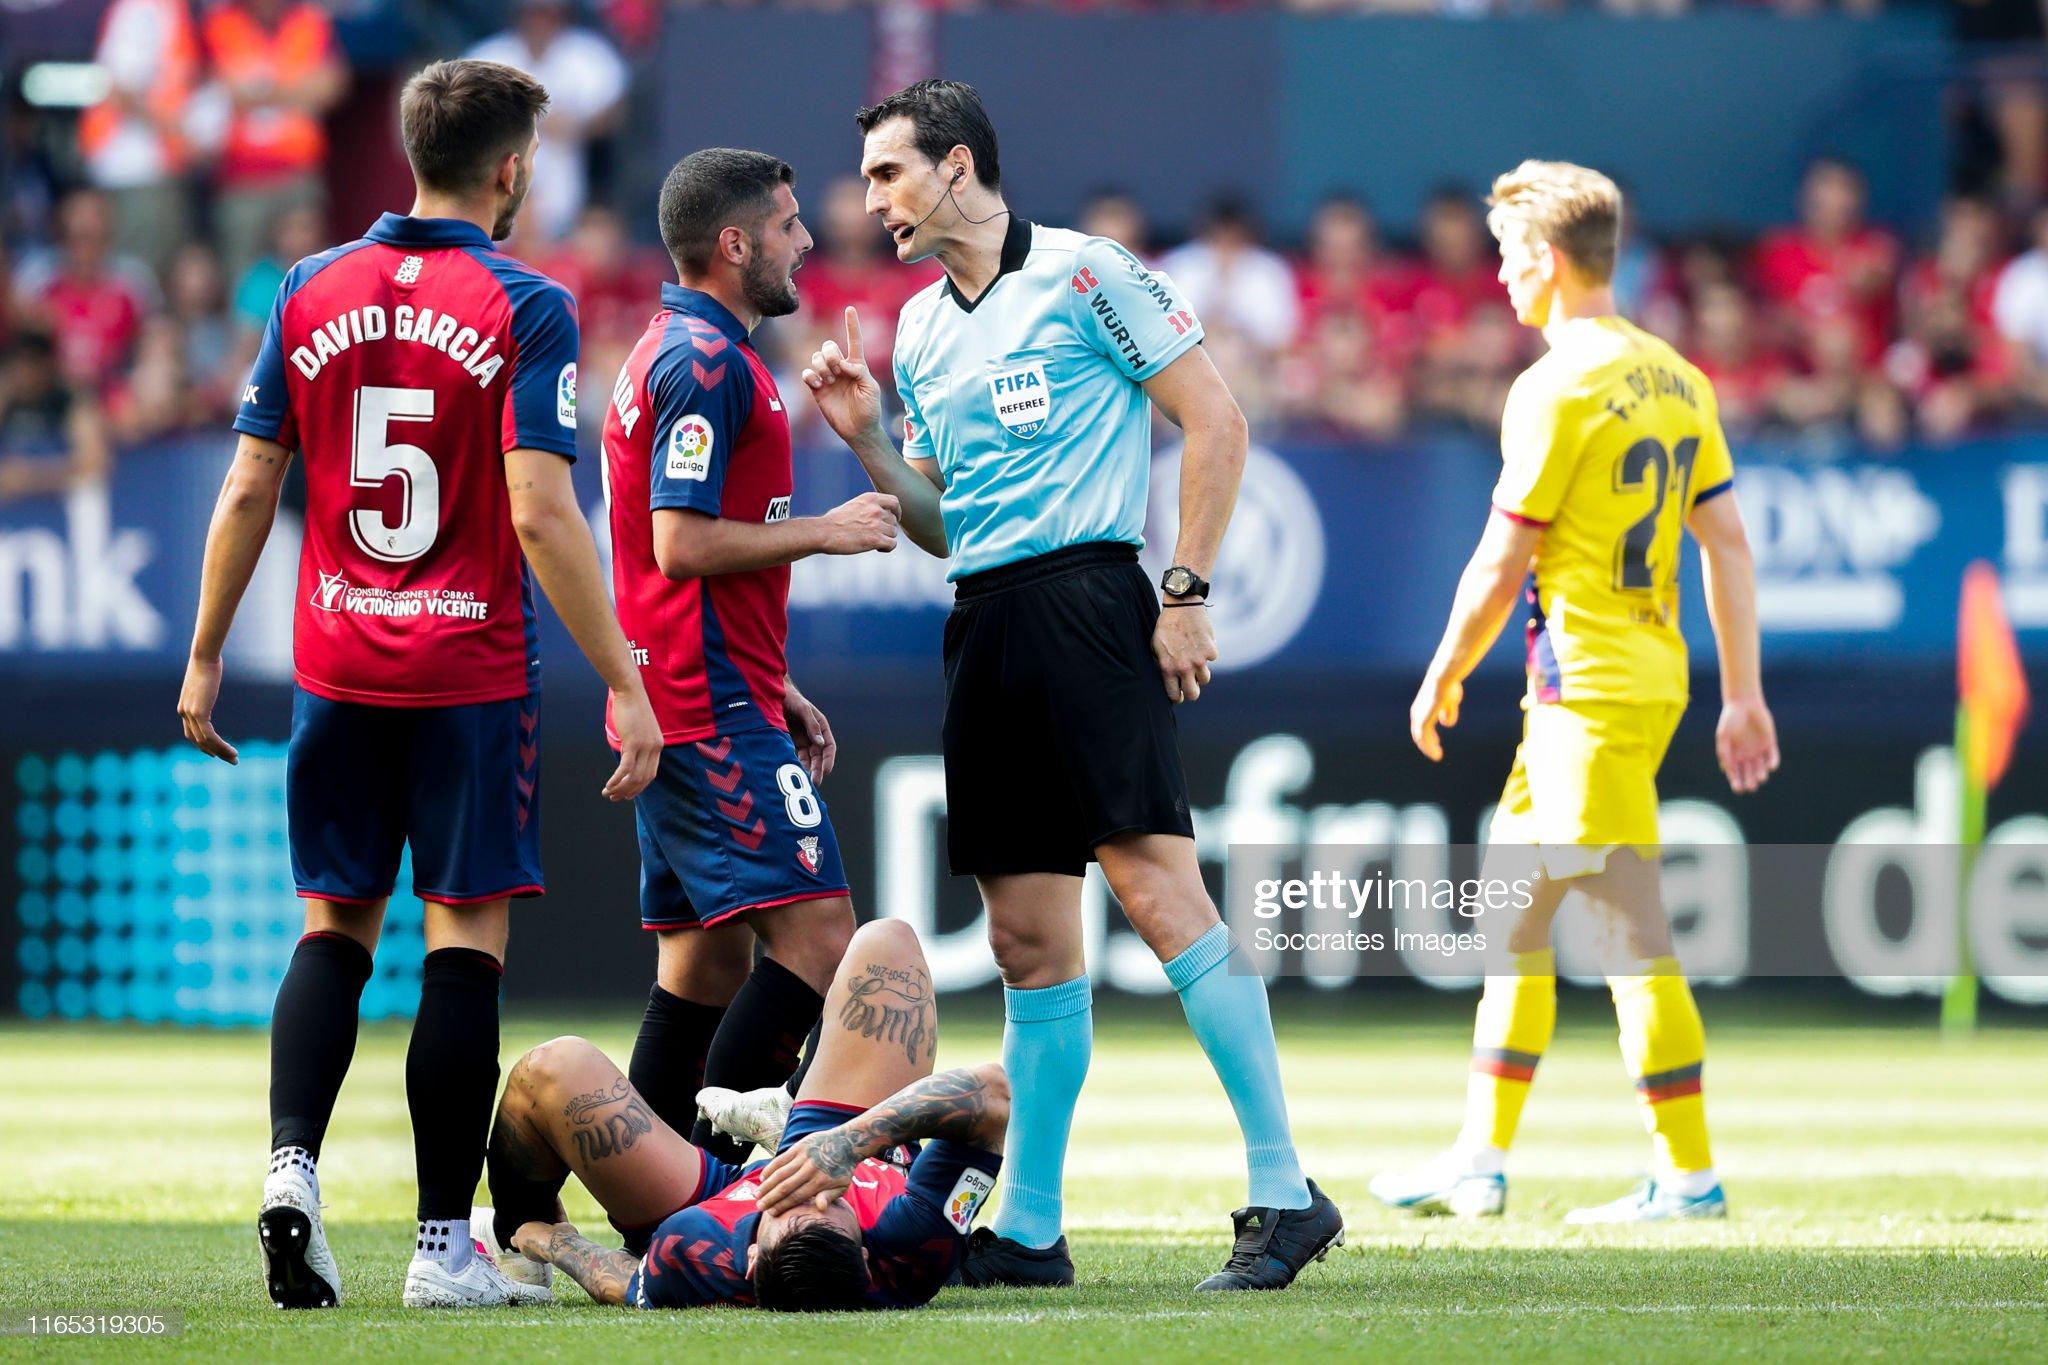 صور مباراة : أوساسونا - برشلونة 2-2 ( 31-08-2019 )  Fran-merida-of-ca-osasuna-referee-martinez-munuera-during-the-la-liga-picture-id1165319305?s=2048x2048